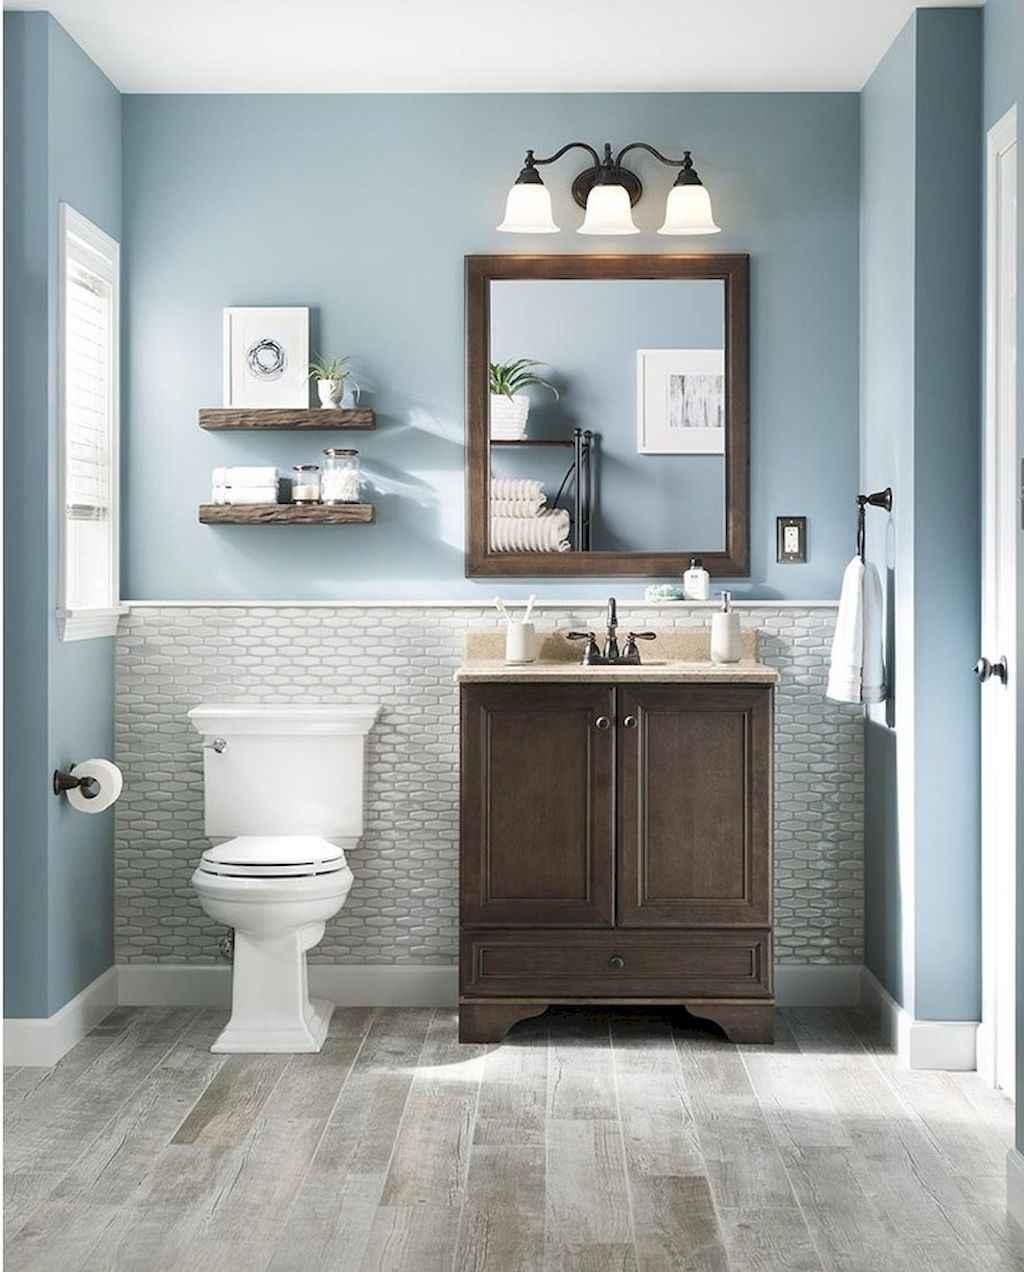 60 inspiring bathroom remodel ideas 59 for Gray and brown bathroom ideas